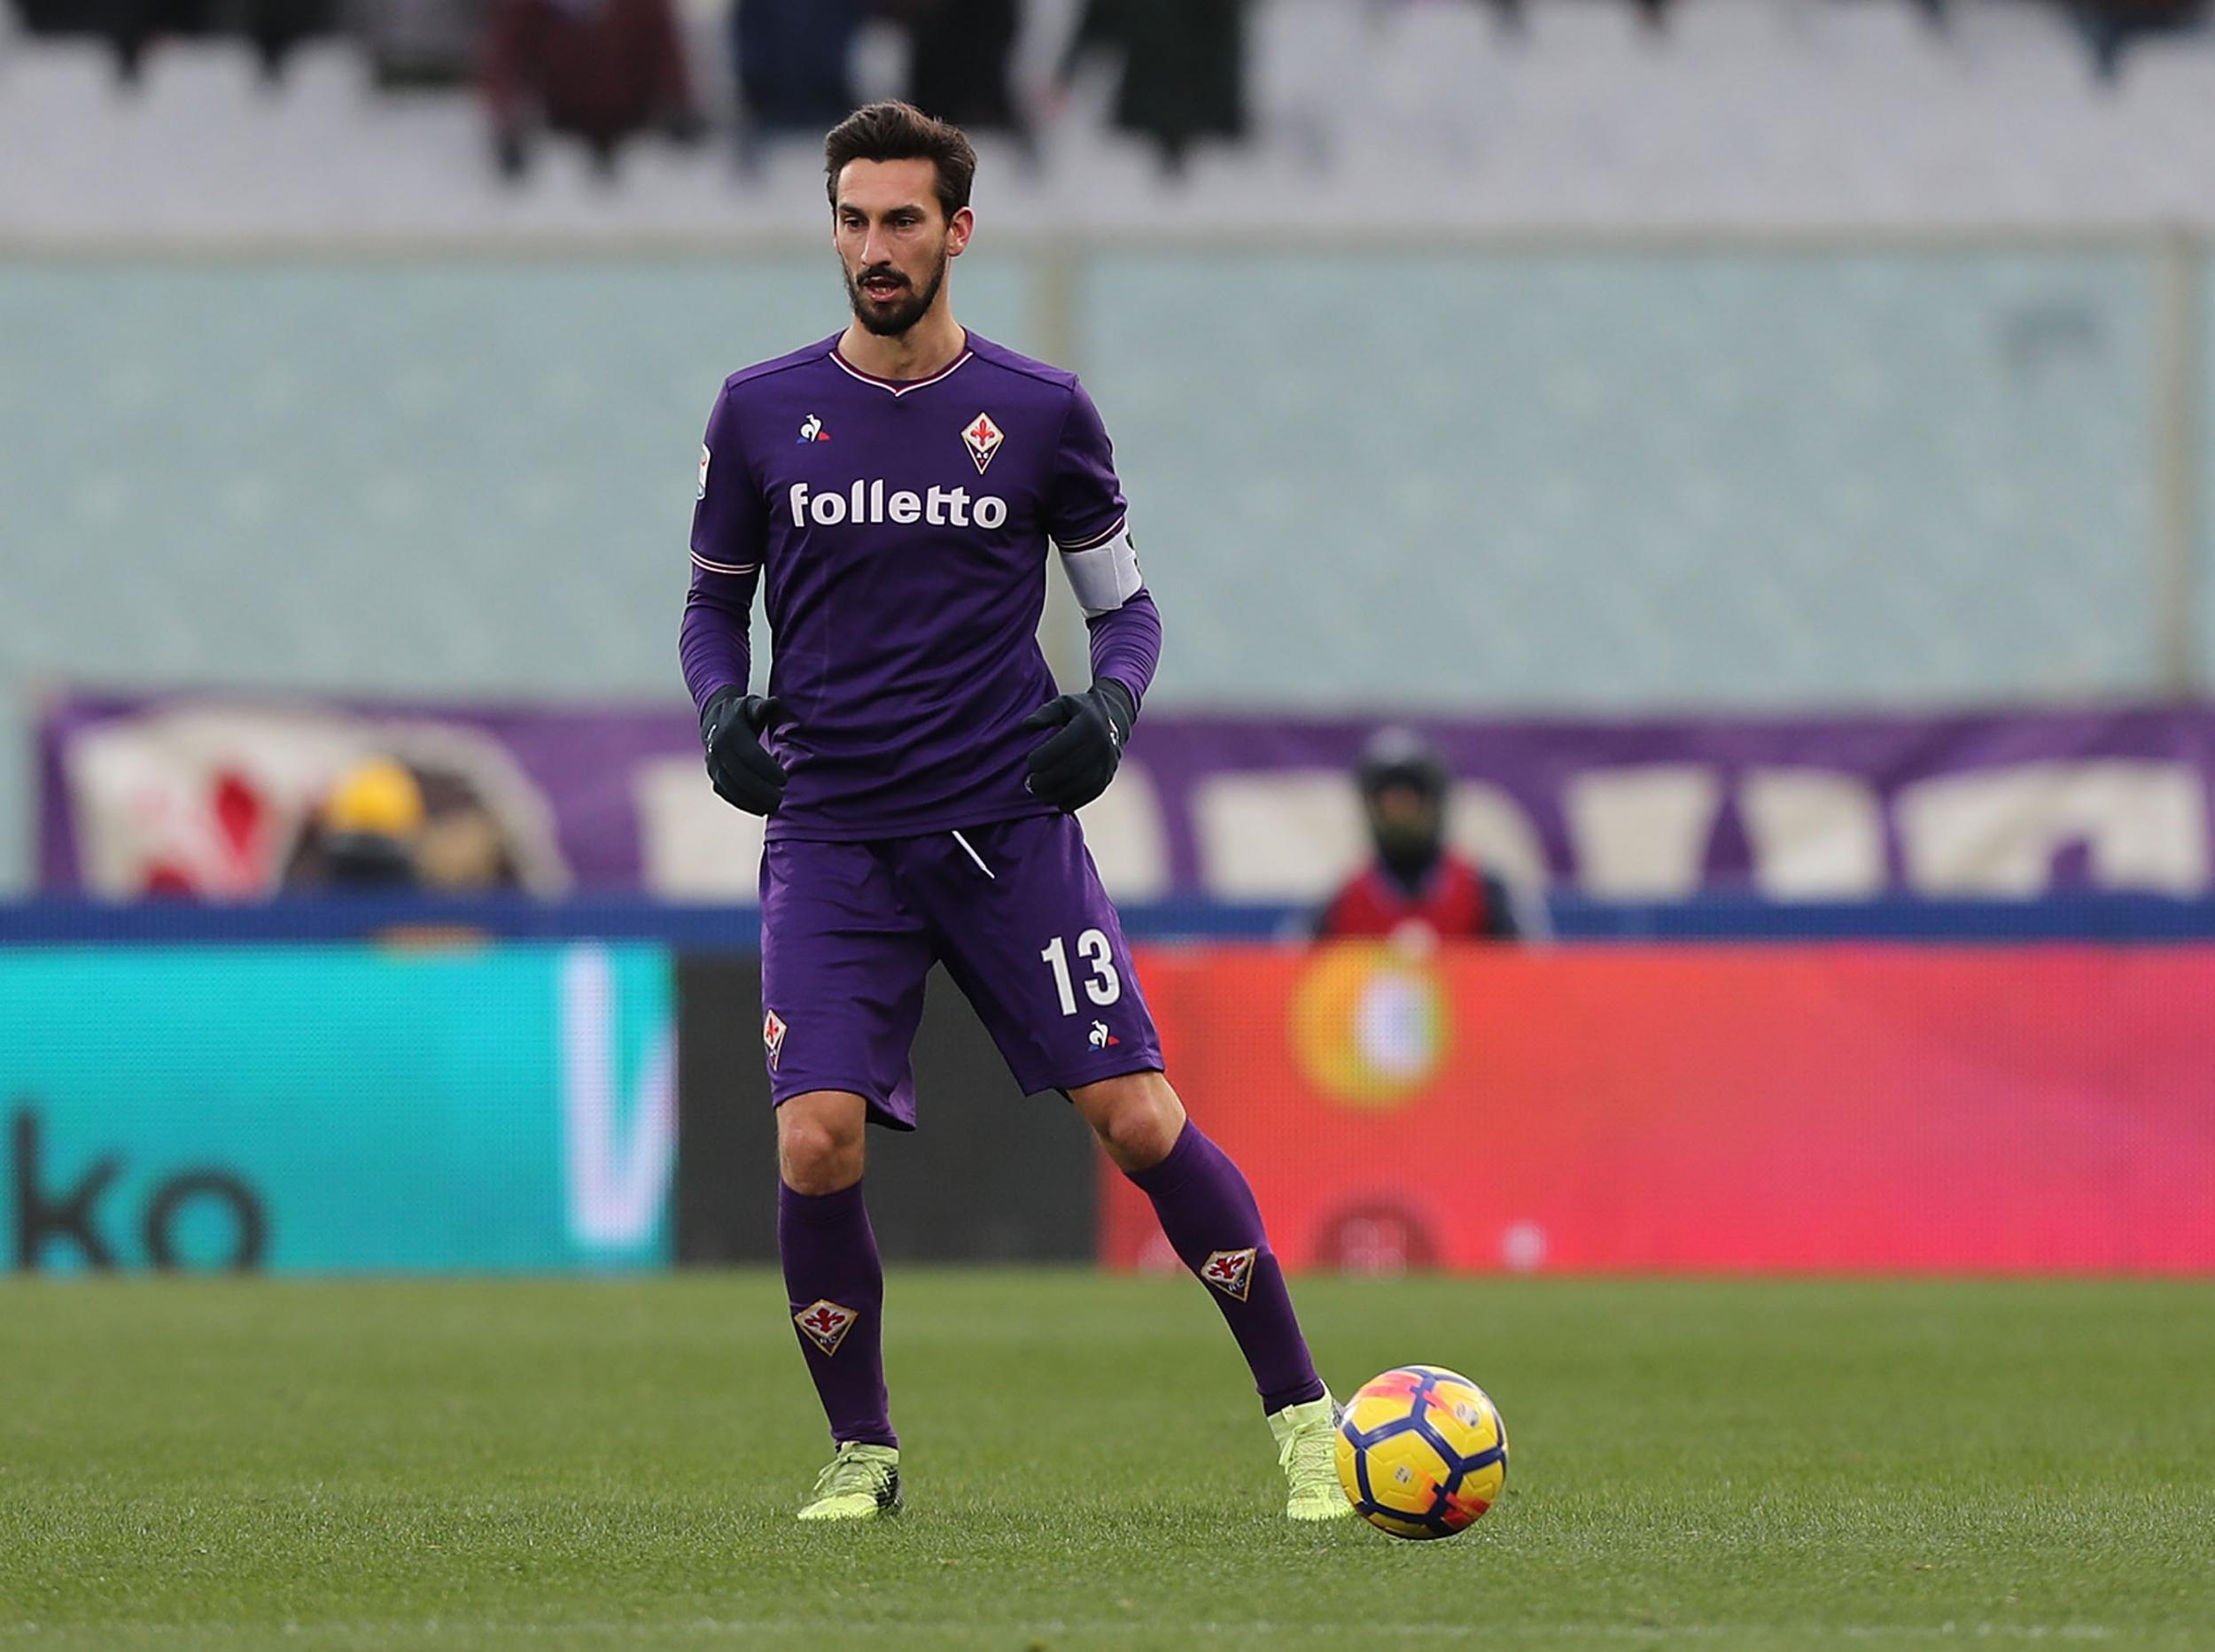 Davide Astori dead: Fiorentina captain and Italy international found dead in hotel room, aged 31